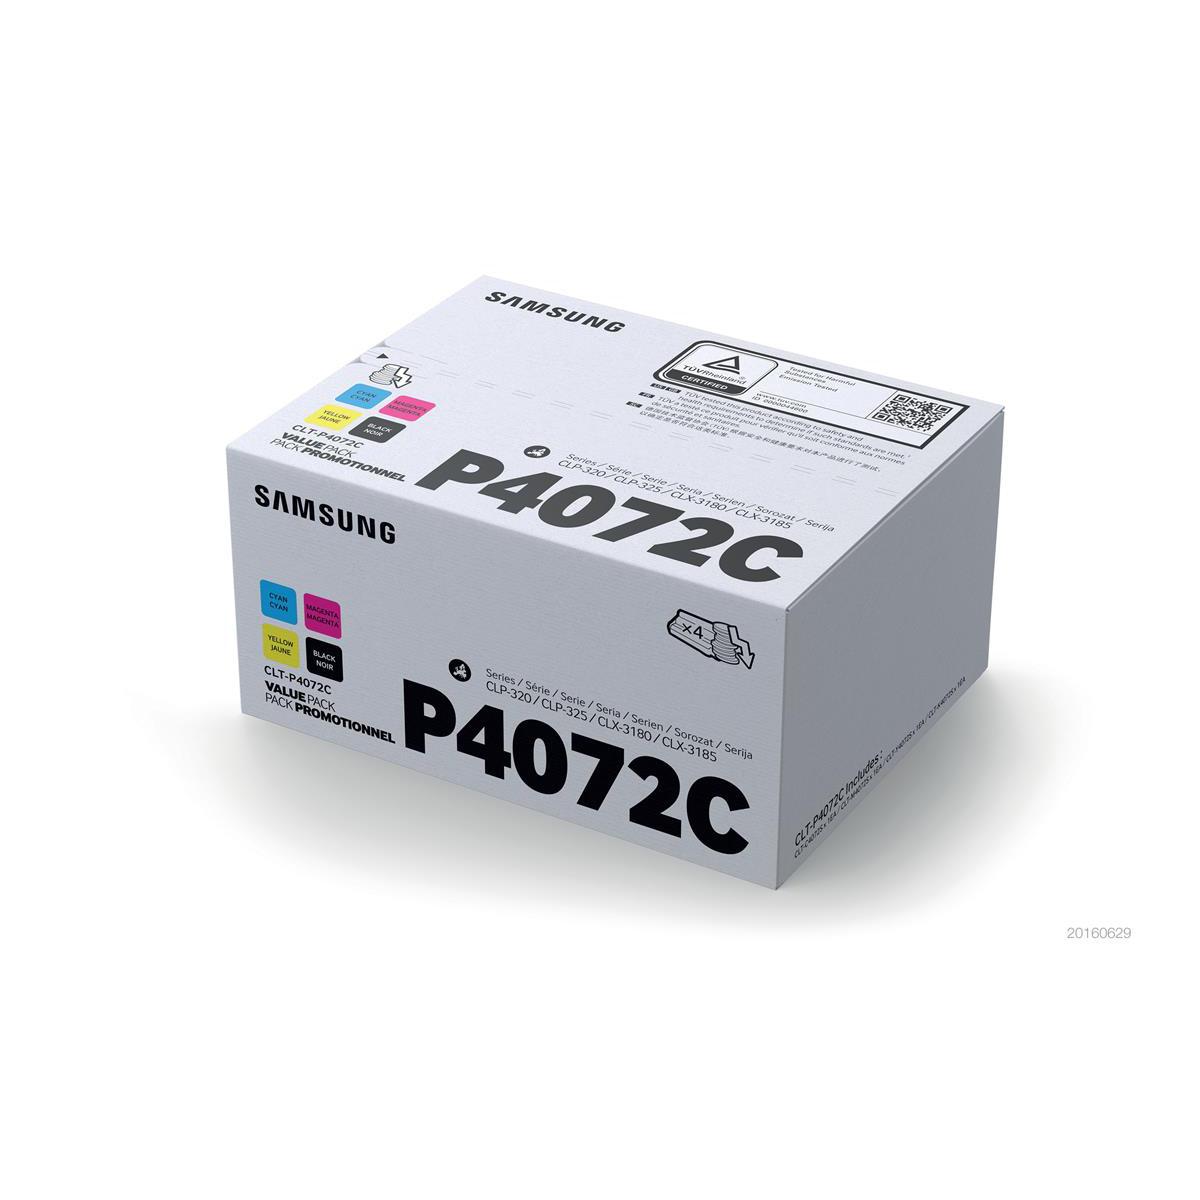 Samsung CLT-P4072C Toner CartPage Life1500ppBlack/Cyan/Magenta/Yell 1000pp Ref CLT-P4072C SU382APack 4